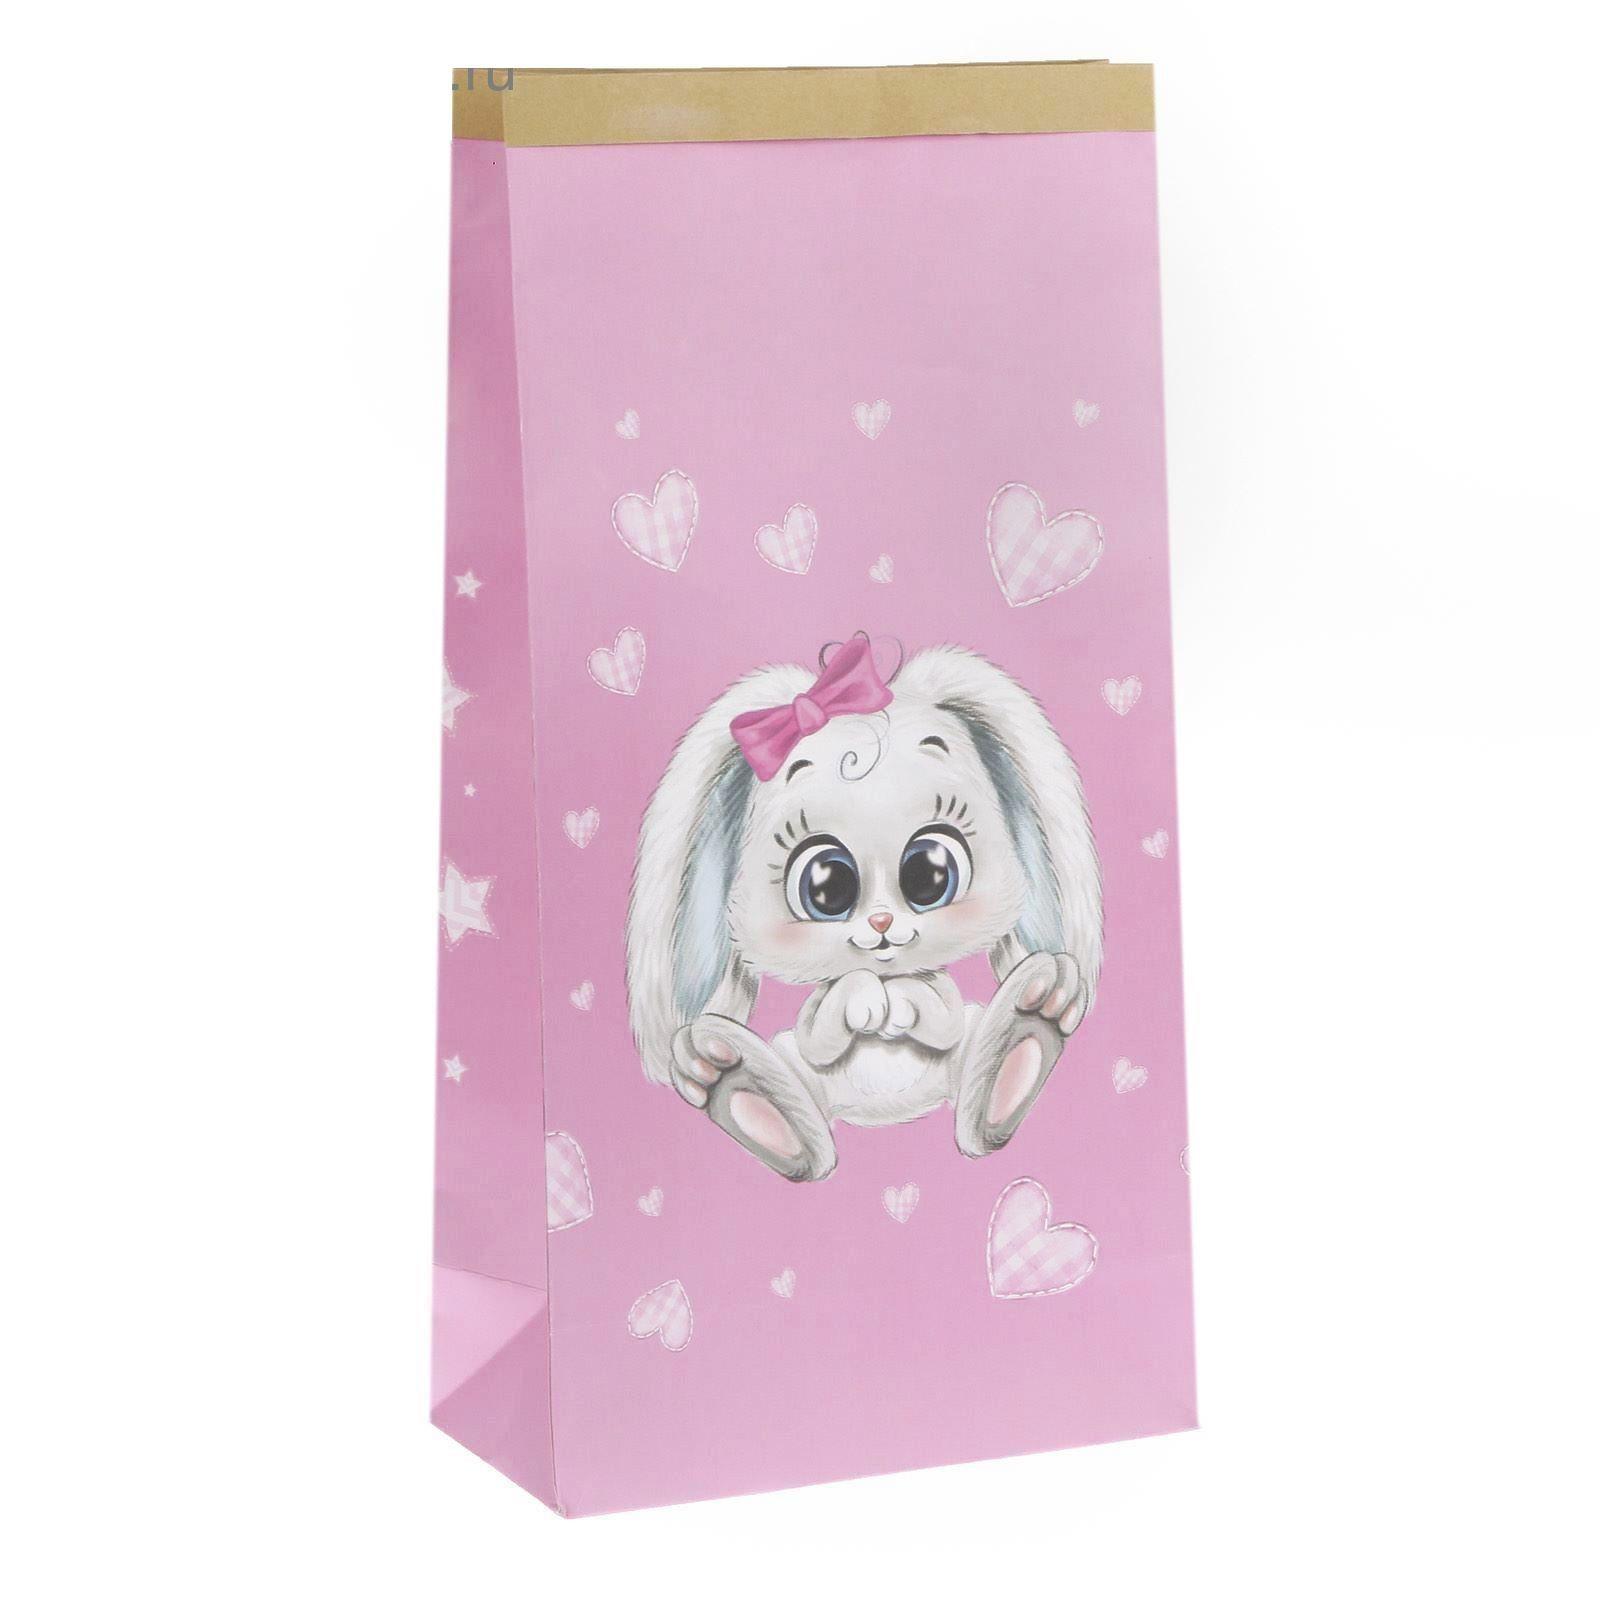 "Крафтовый пакет ""Любимая малышка"", 32 х 64 см"